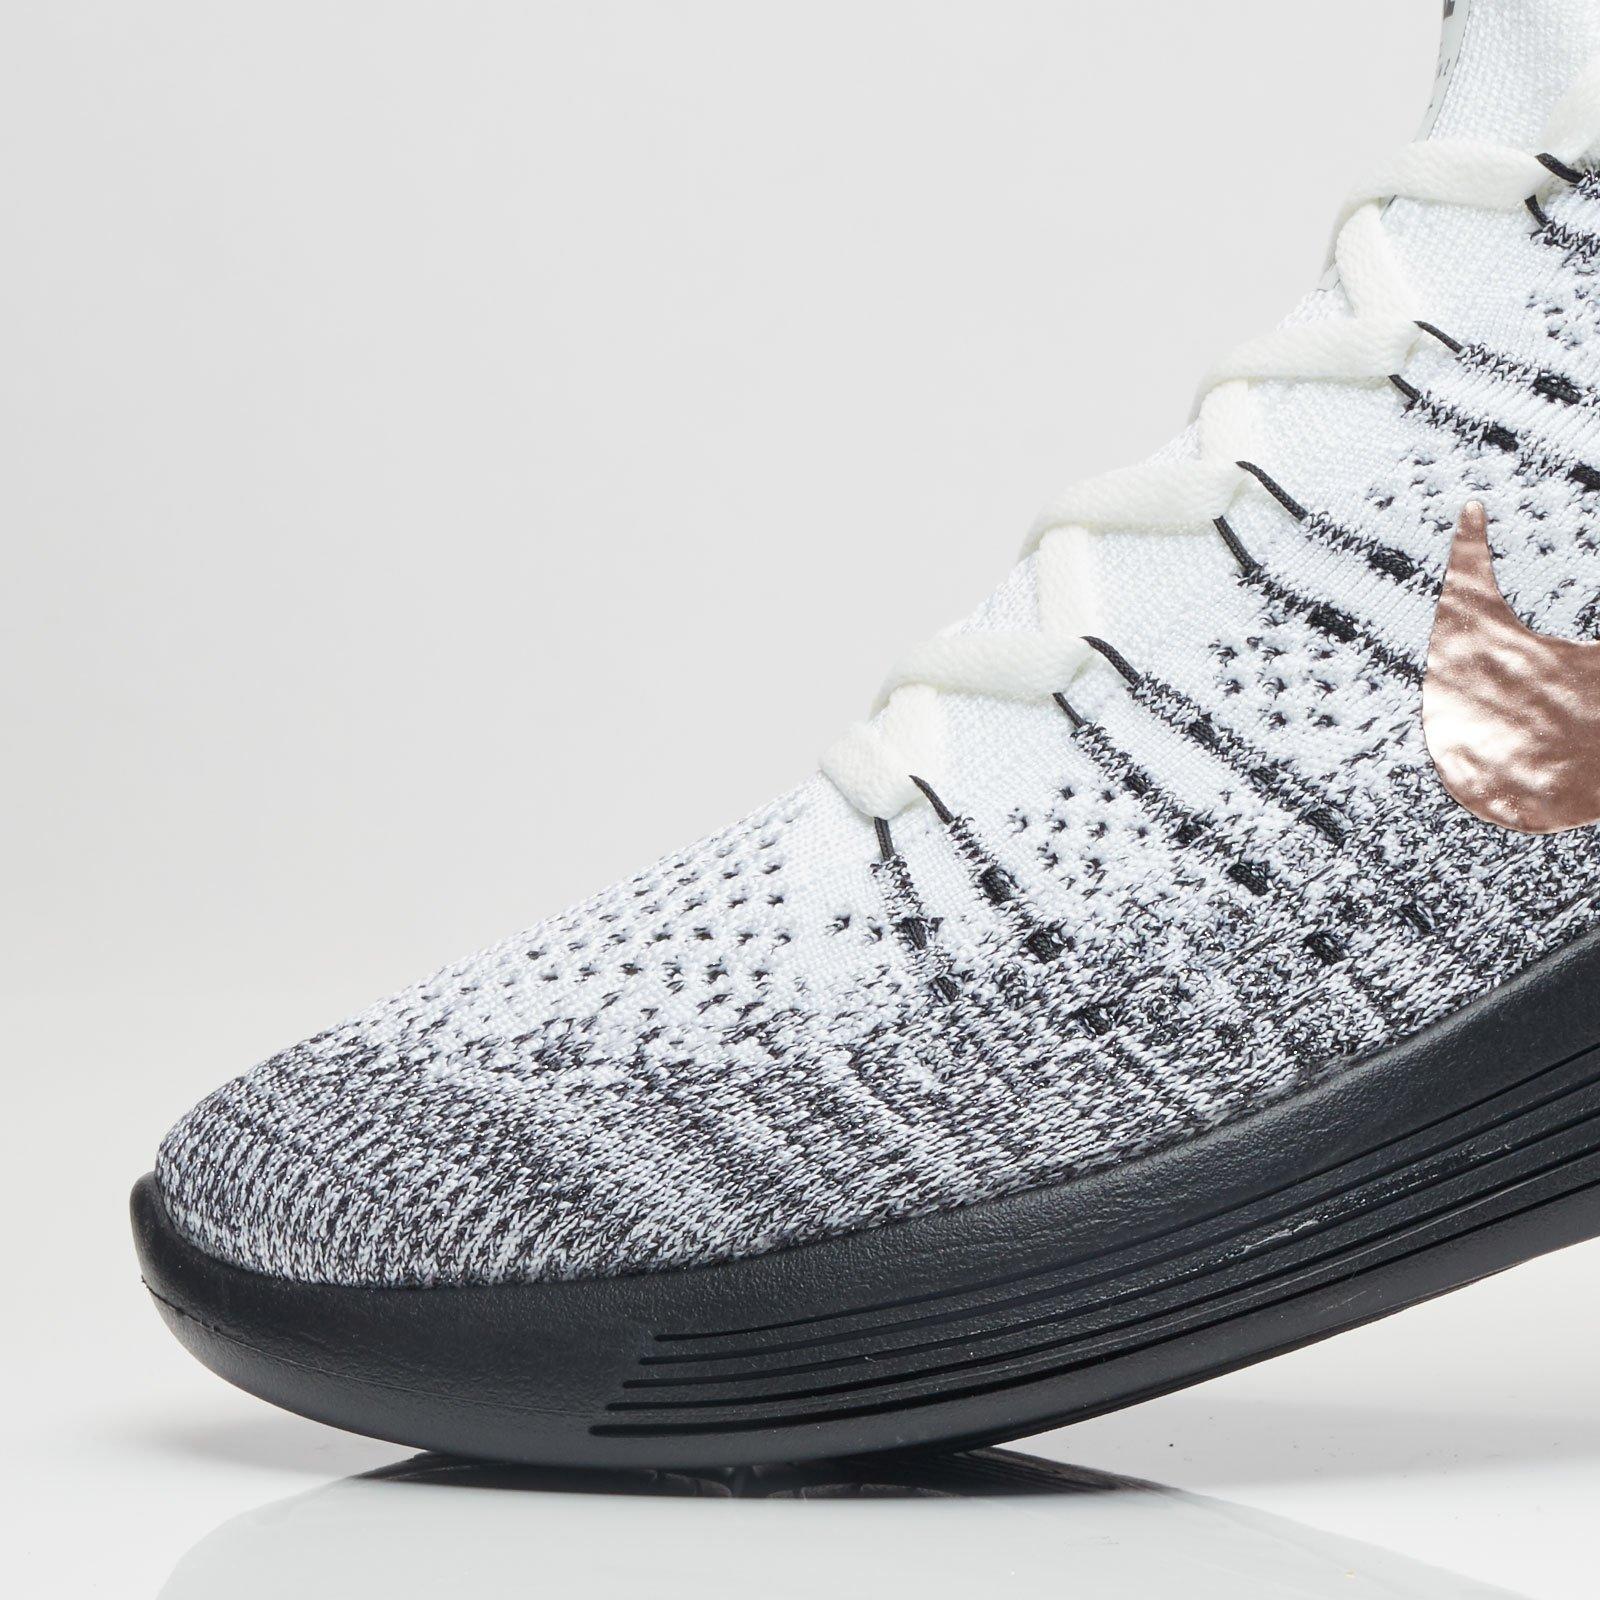 best sneakers 348a6 ebaba Nike Running Lunarepic Low FK 2 X-Plore - 6. Close